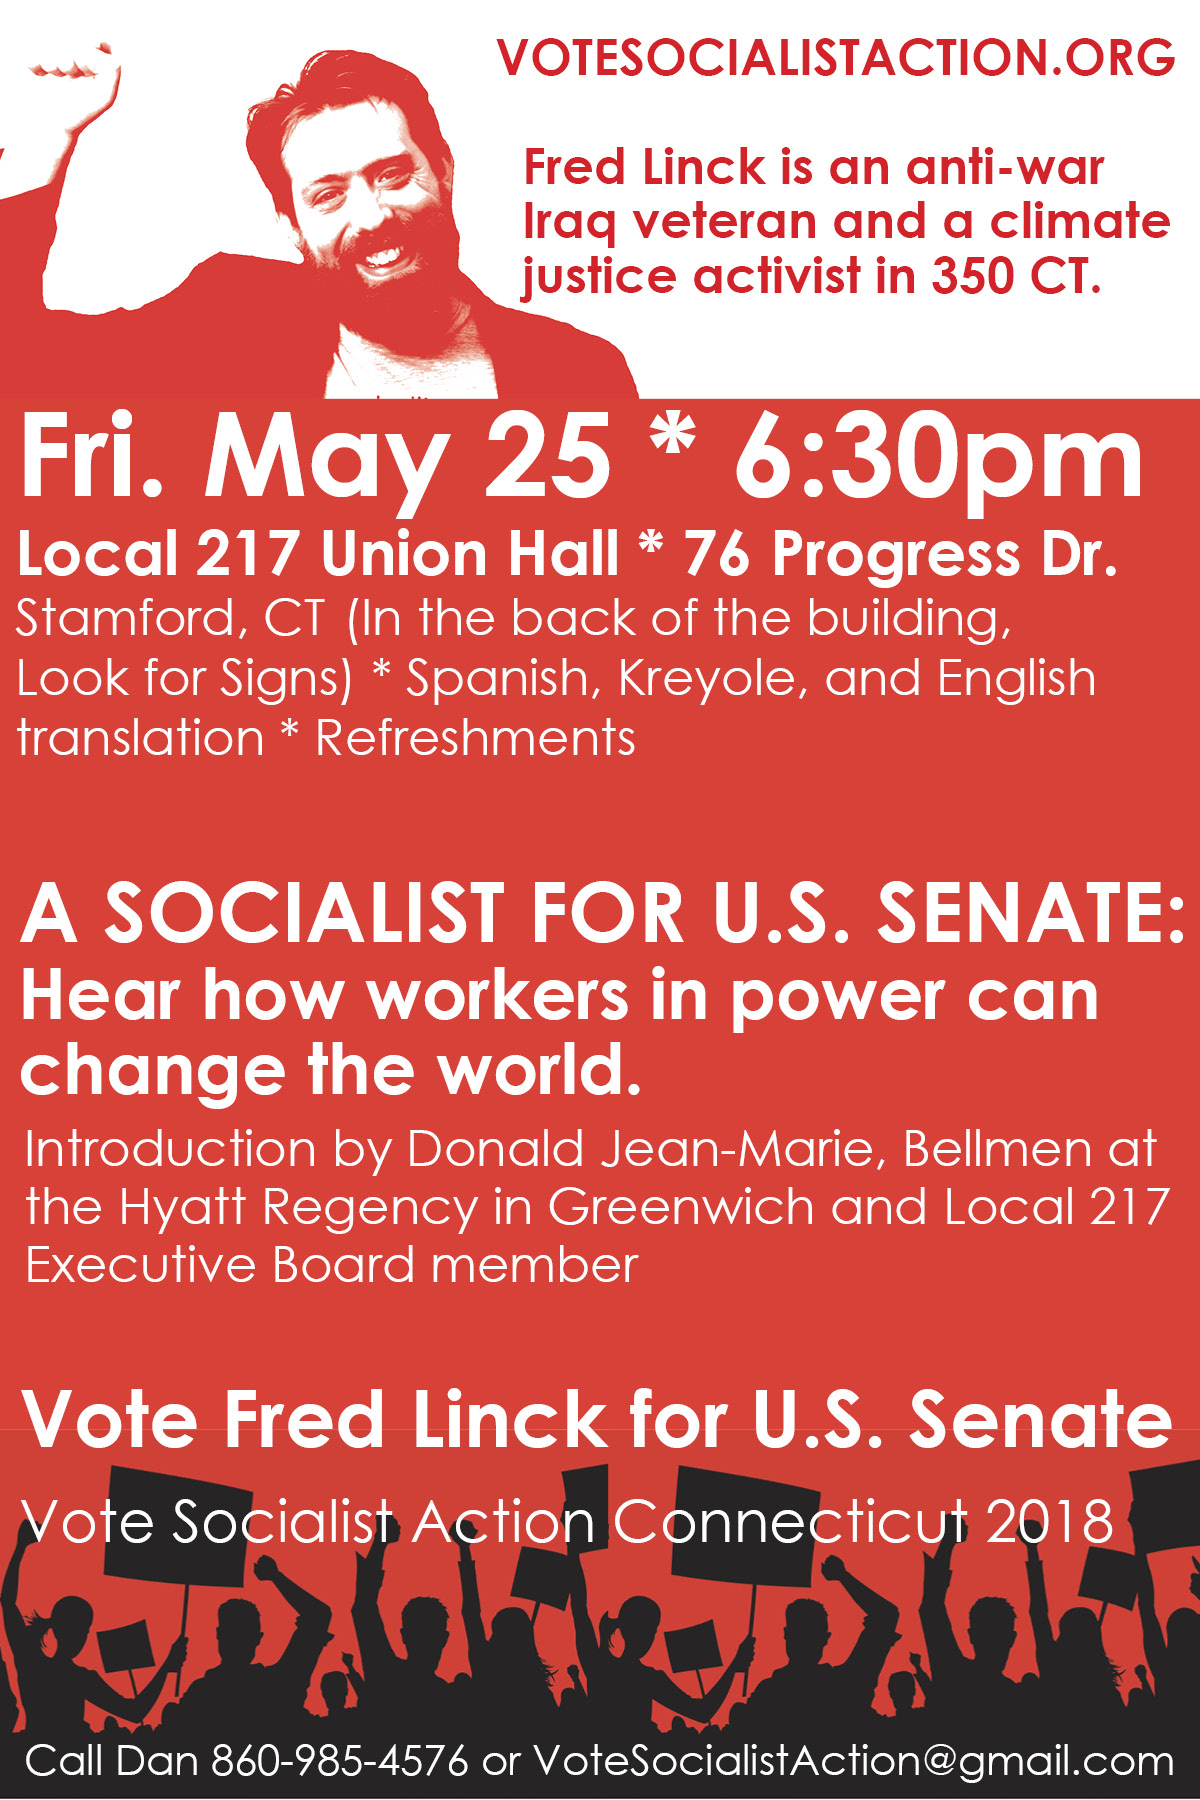 May 25 Stamford, CT